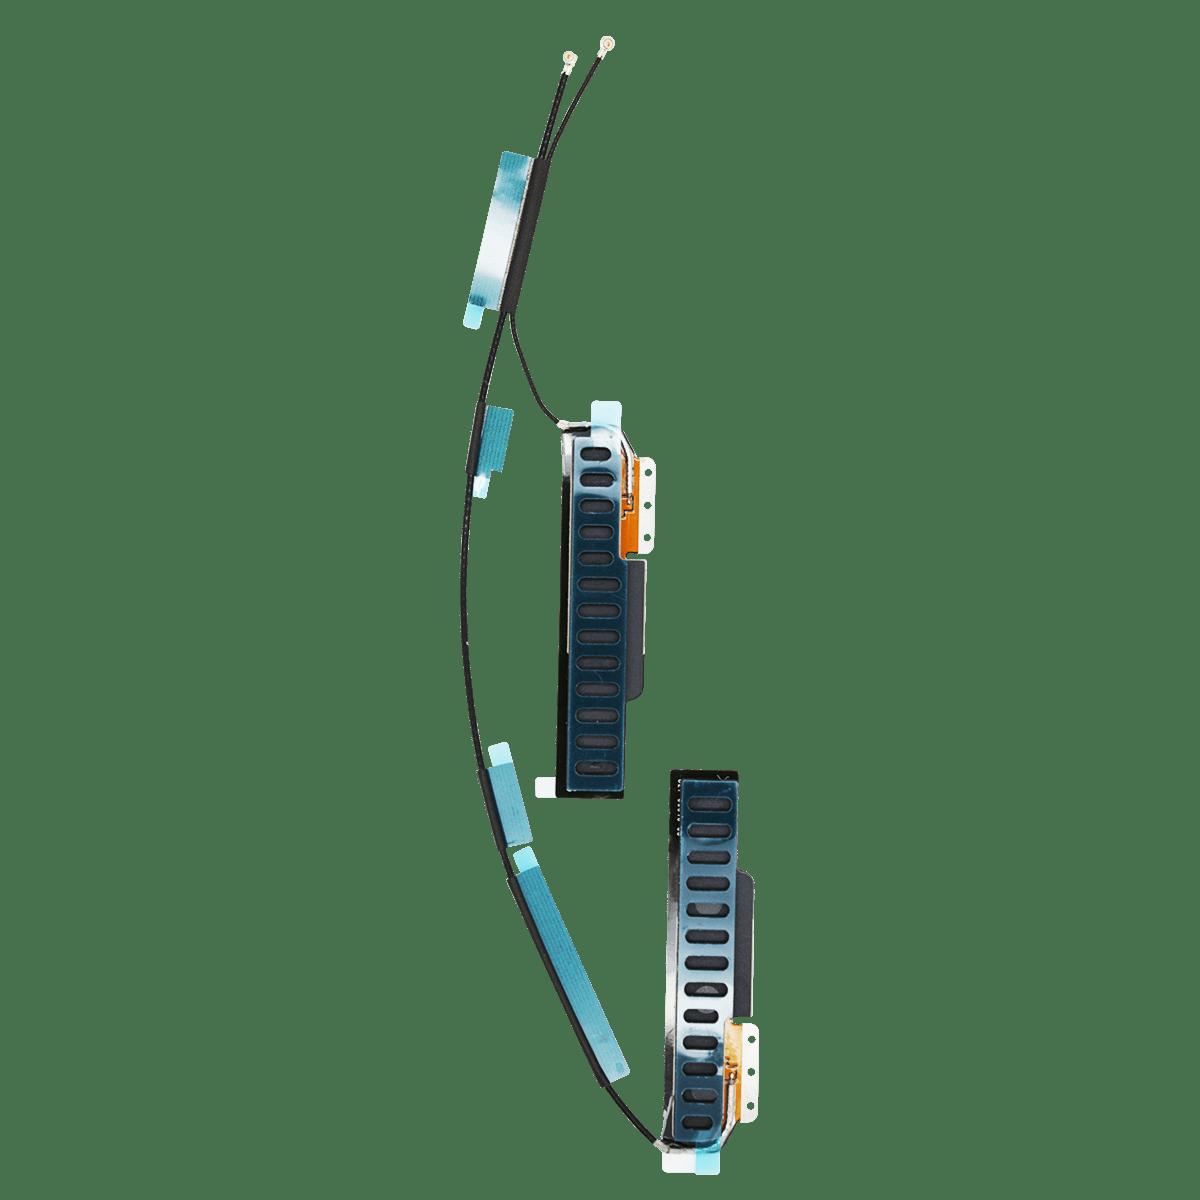 Ipad Air 2 Wifi Antennas